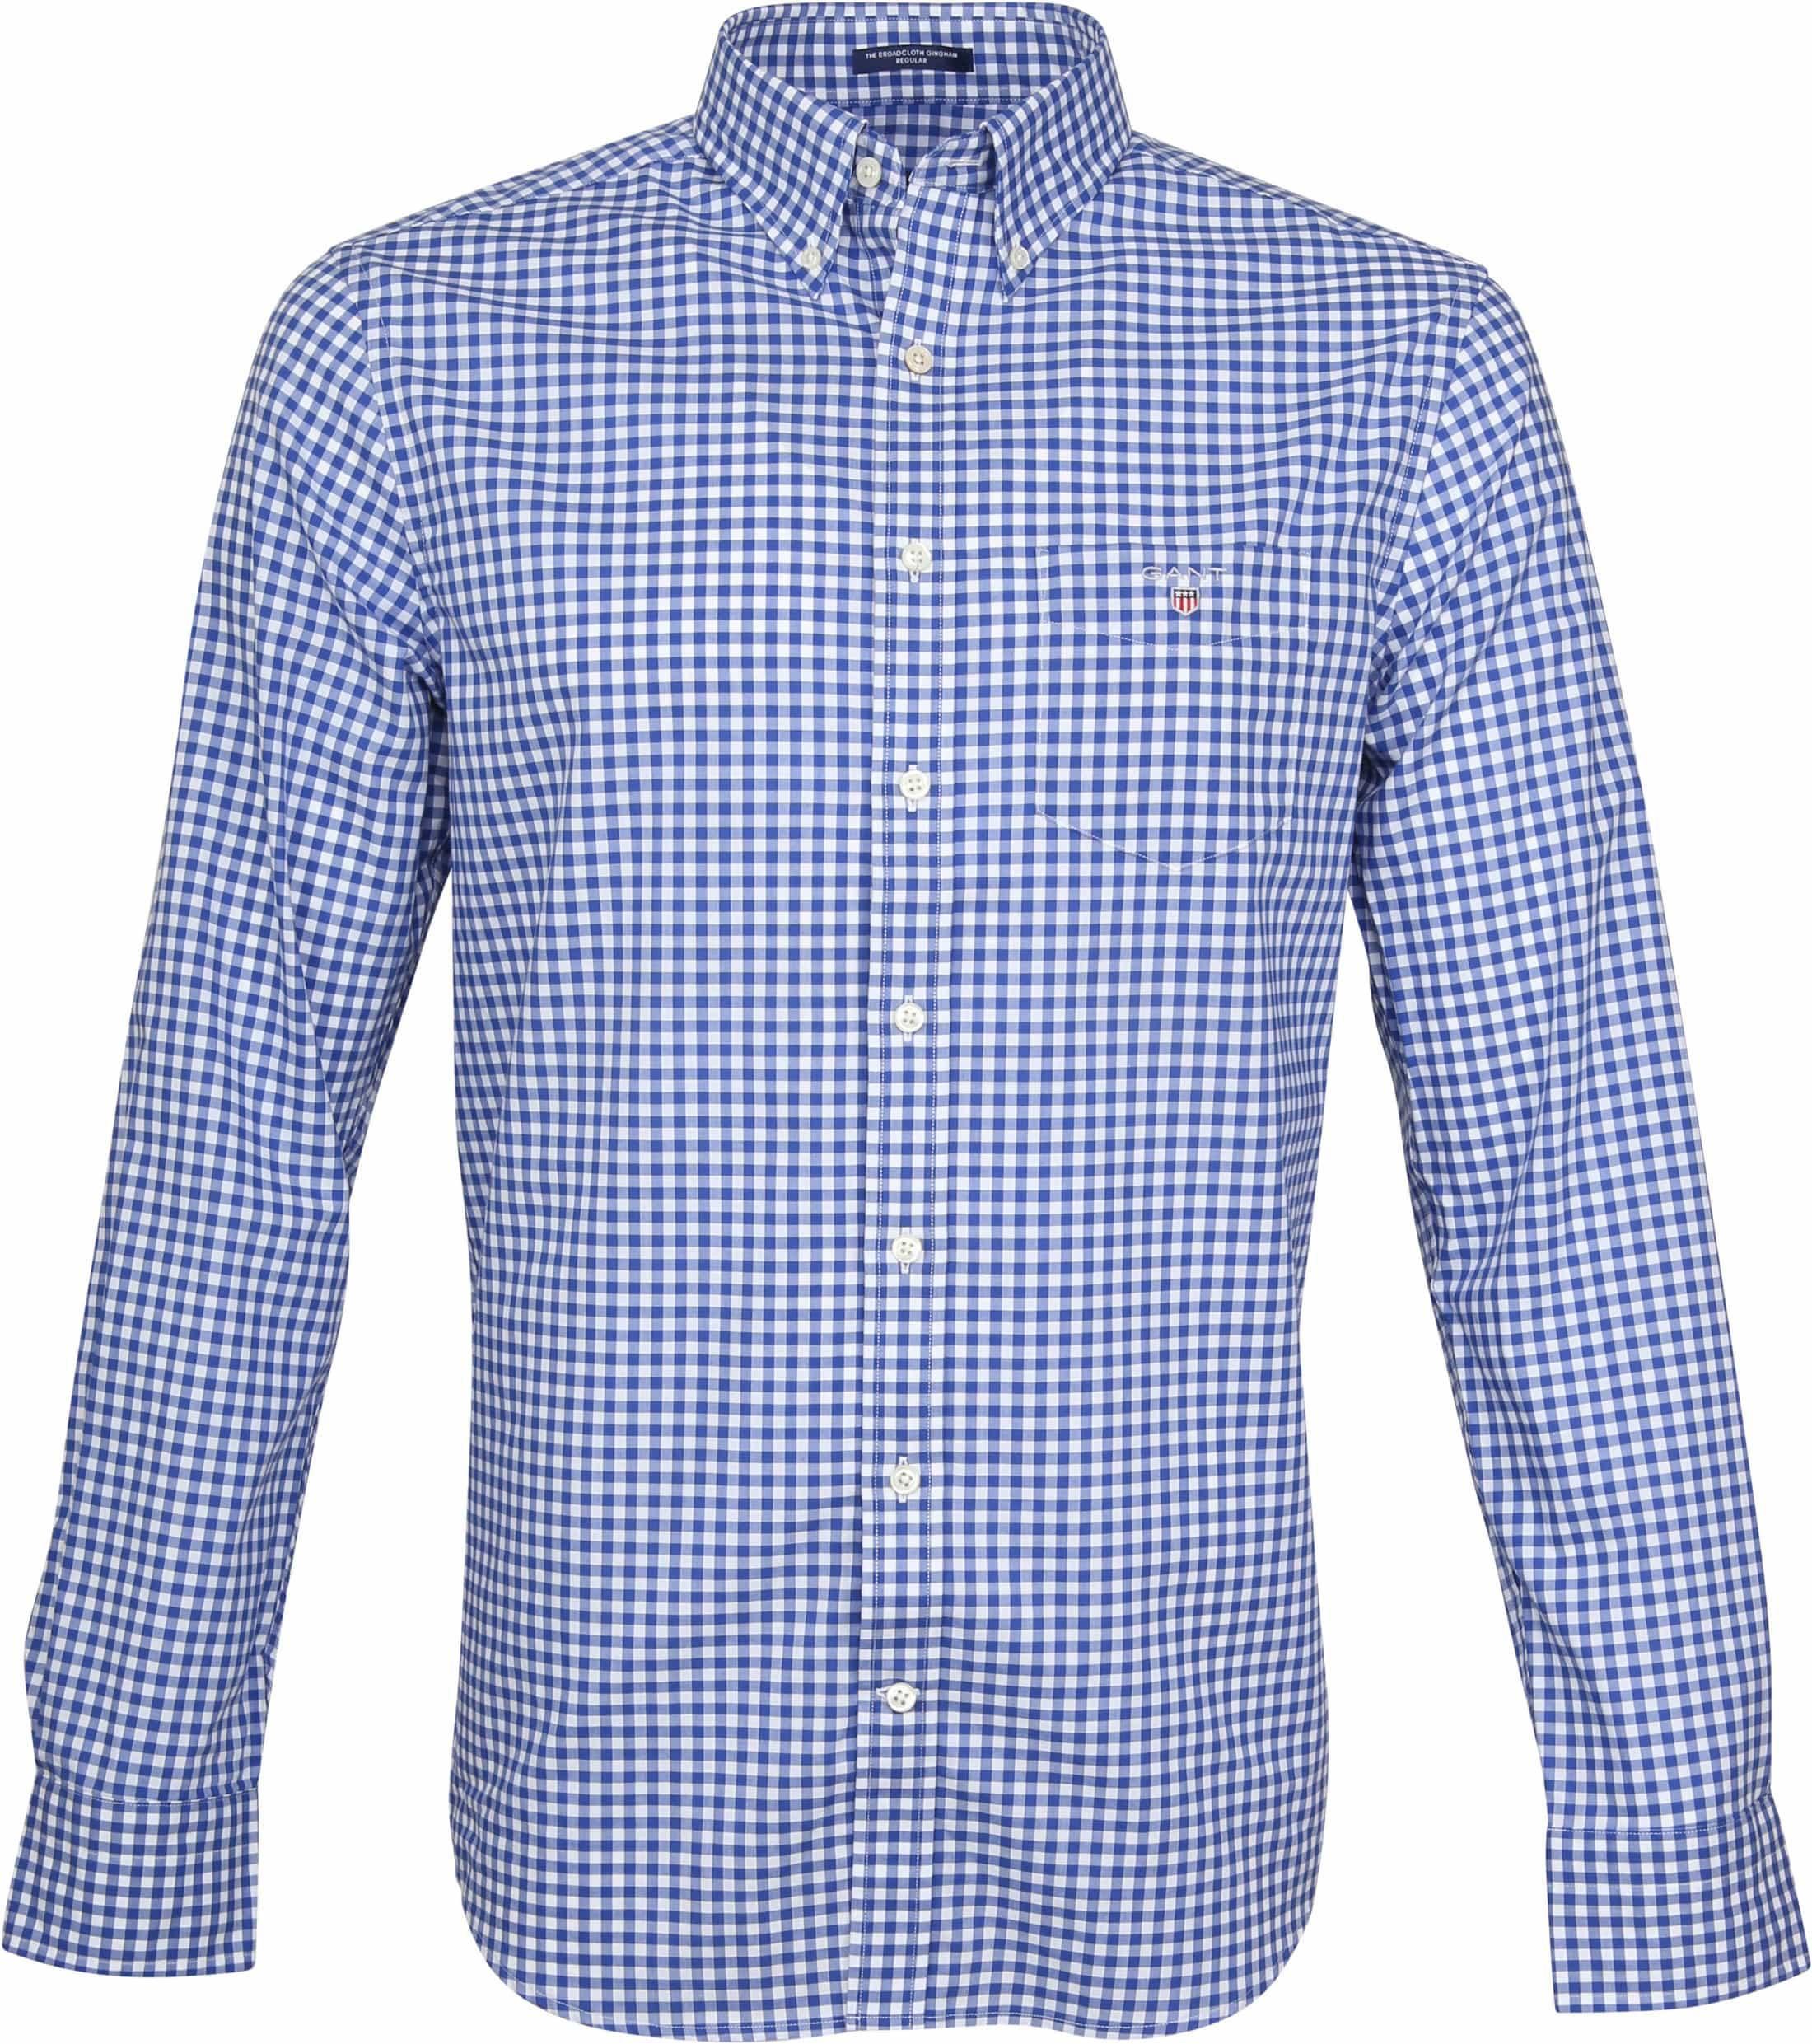 Gant Gingham Shirt Blue Check foto 0